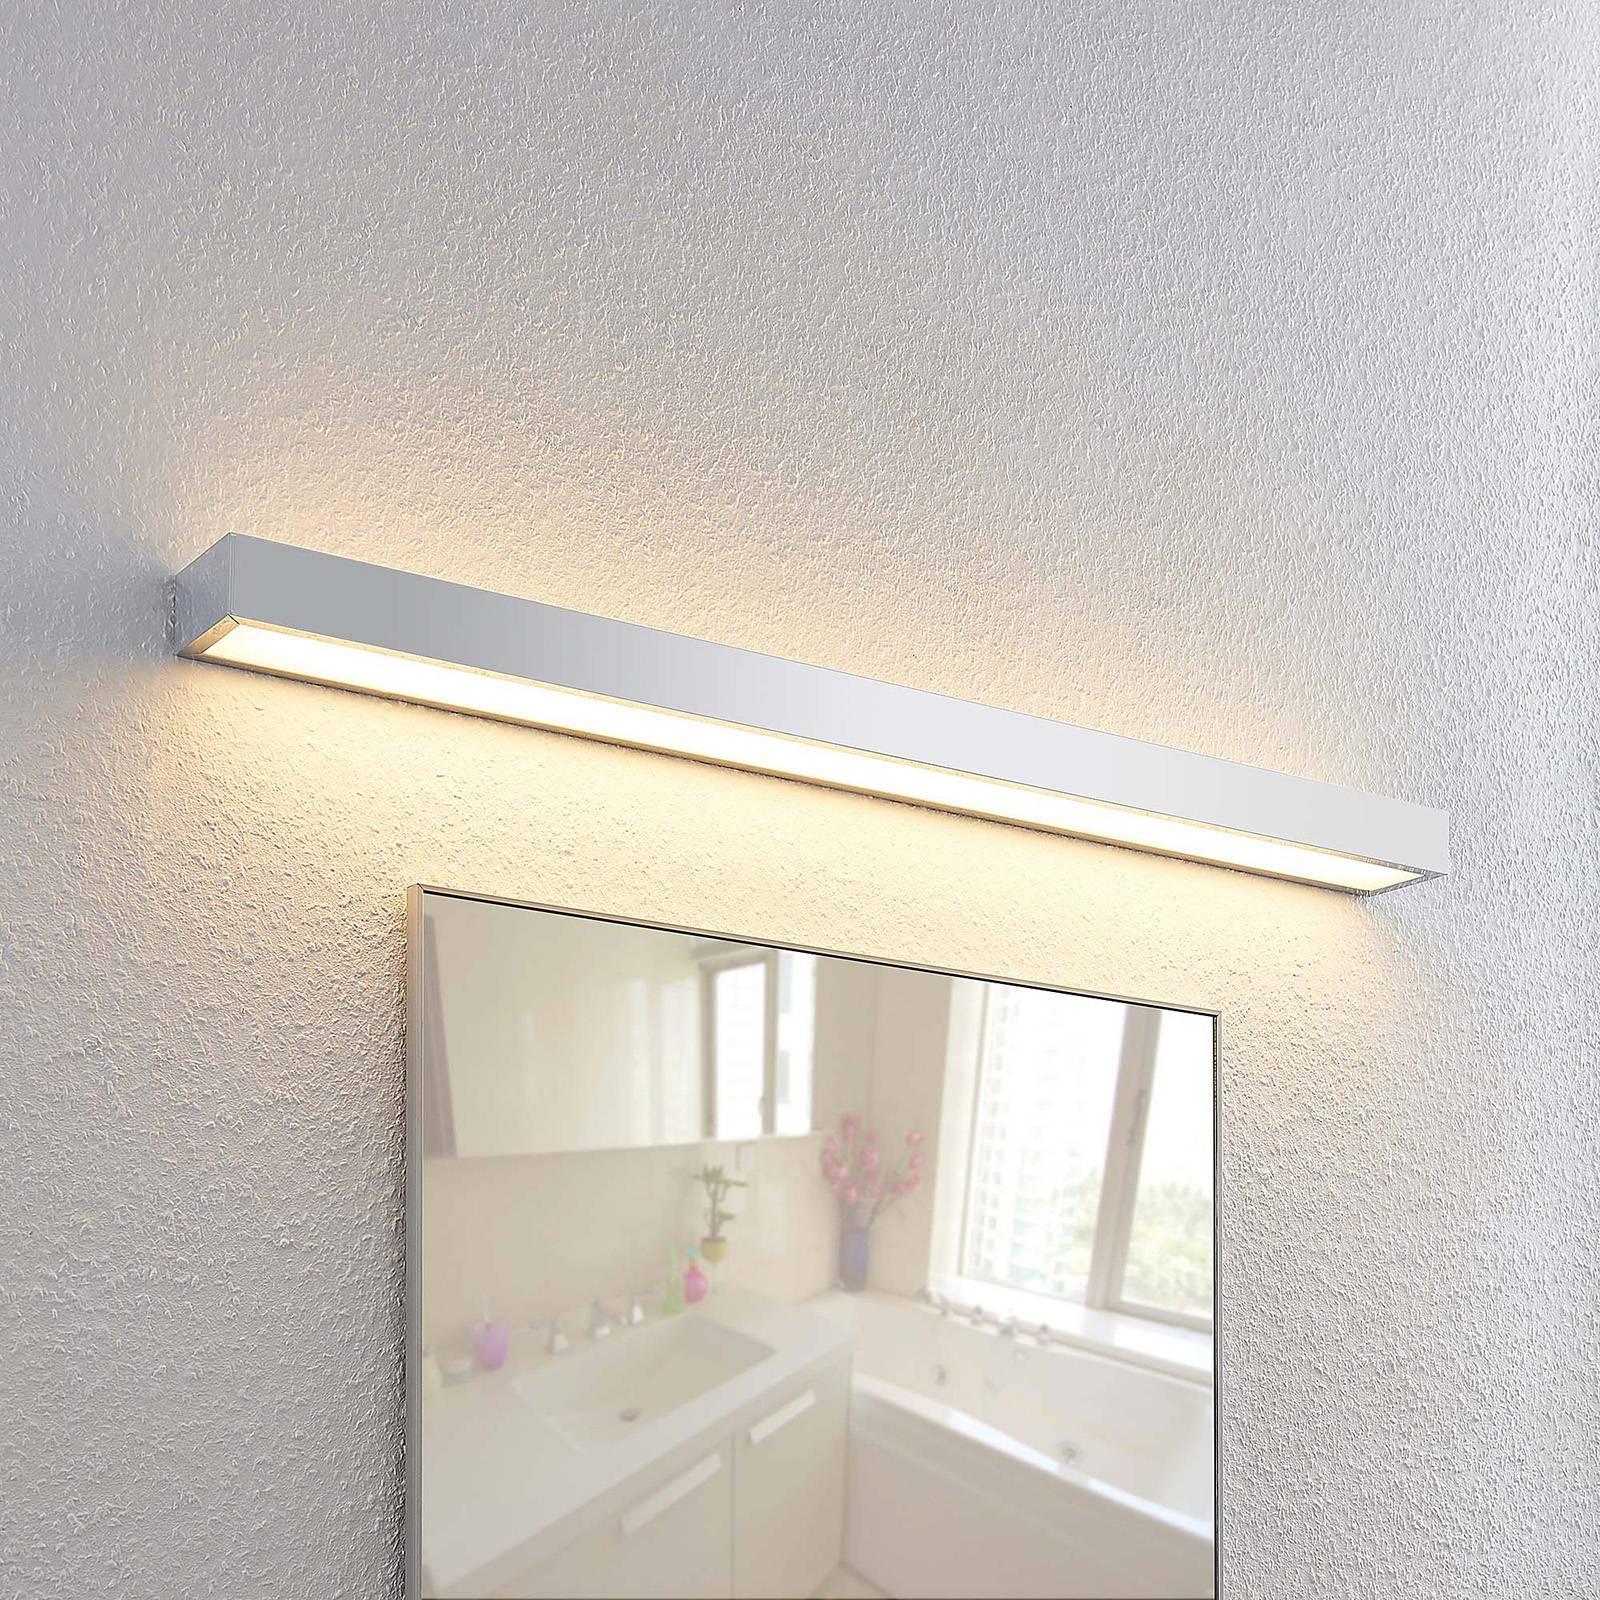 Lindby Layan LED-kylpyhuonevalaisin, kromi, 90 cm